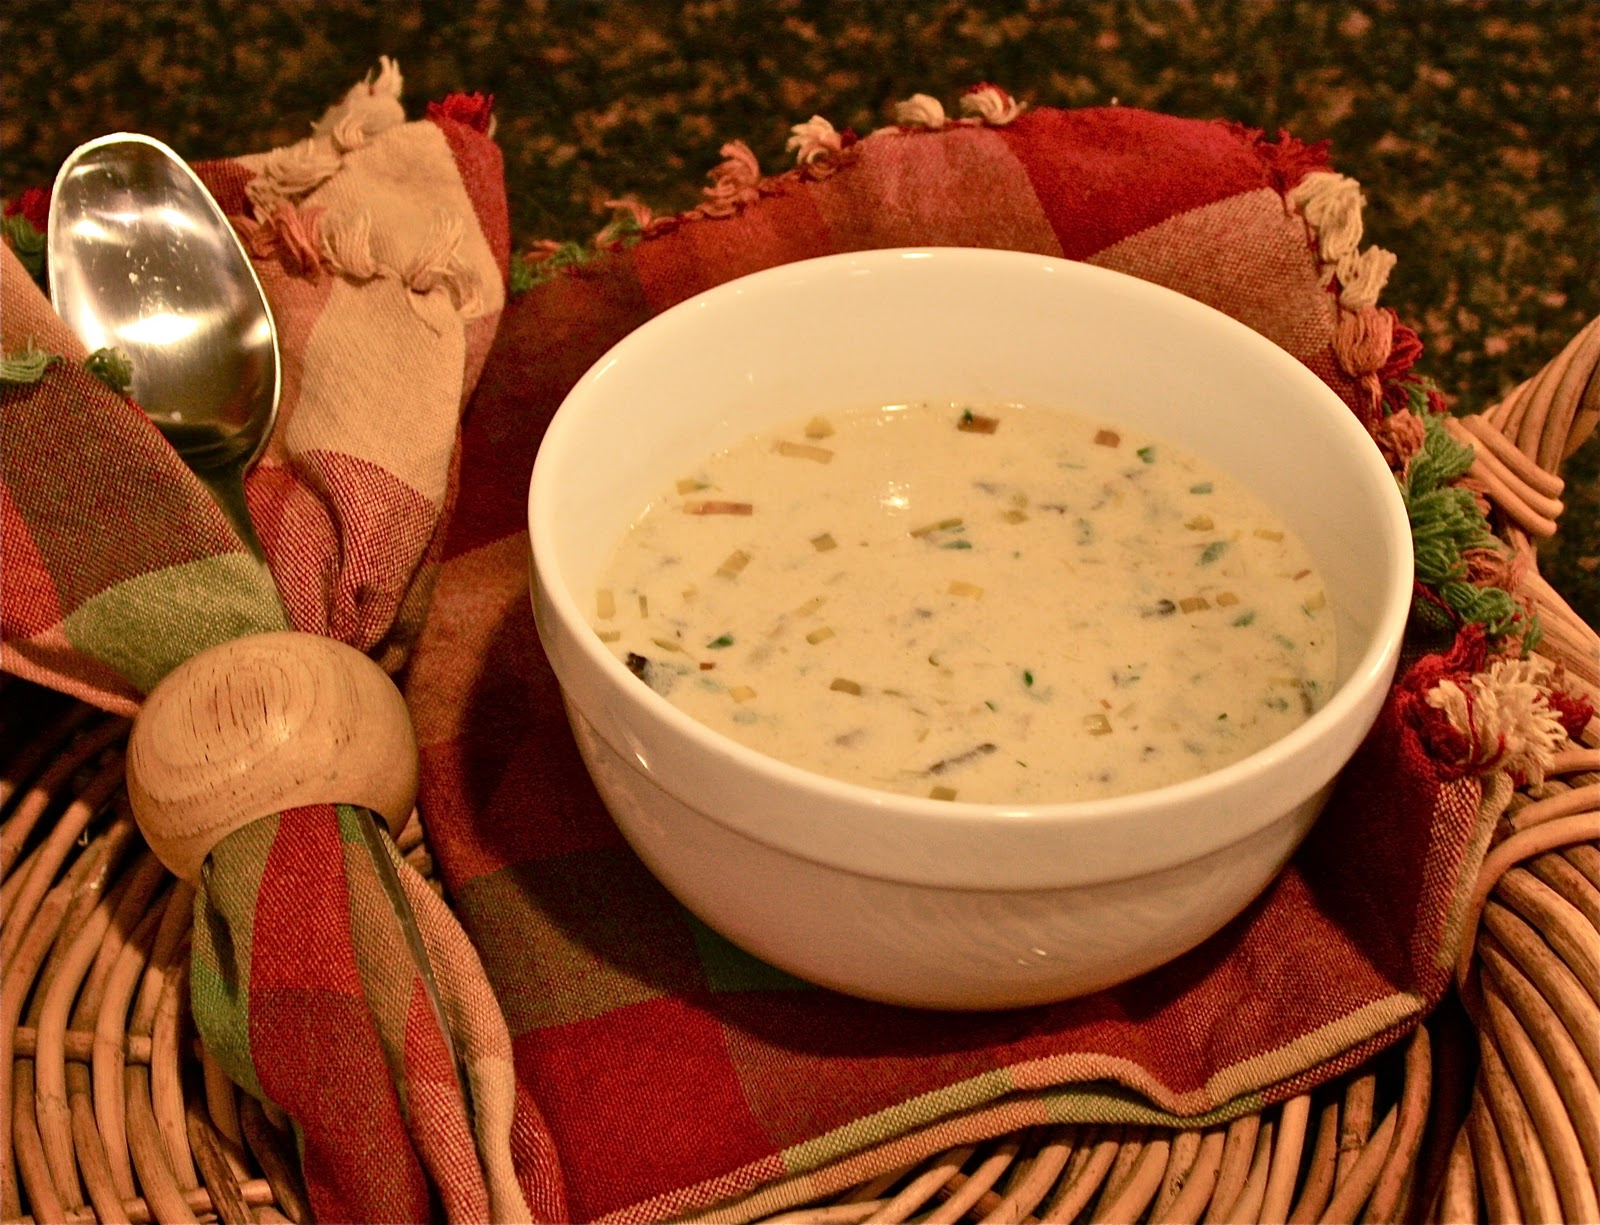 Cora Cooks Home Again Home Again For Creamy Mushroom Soup